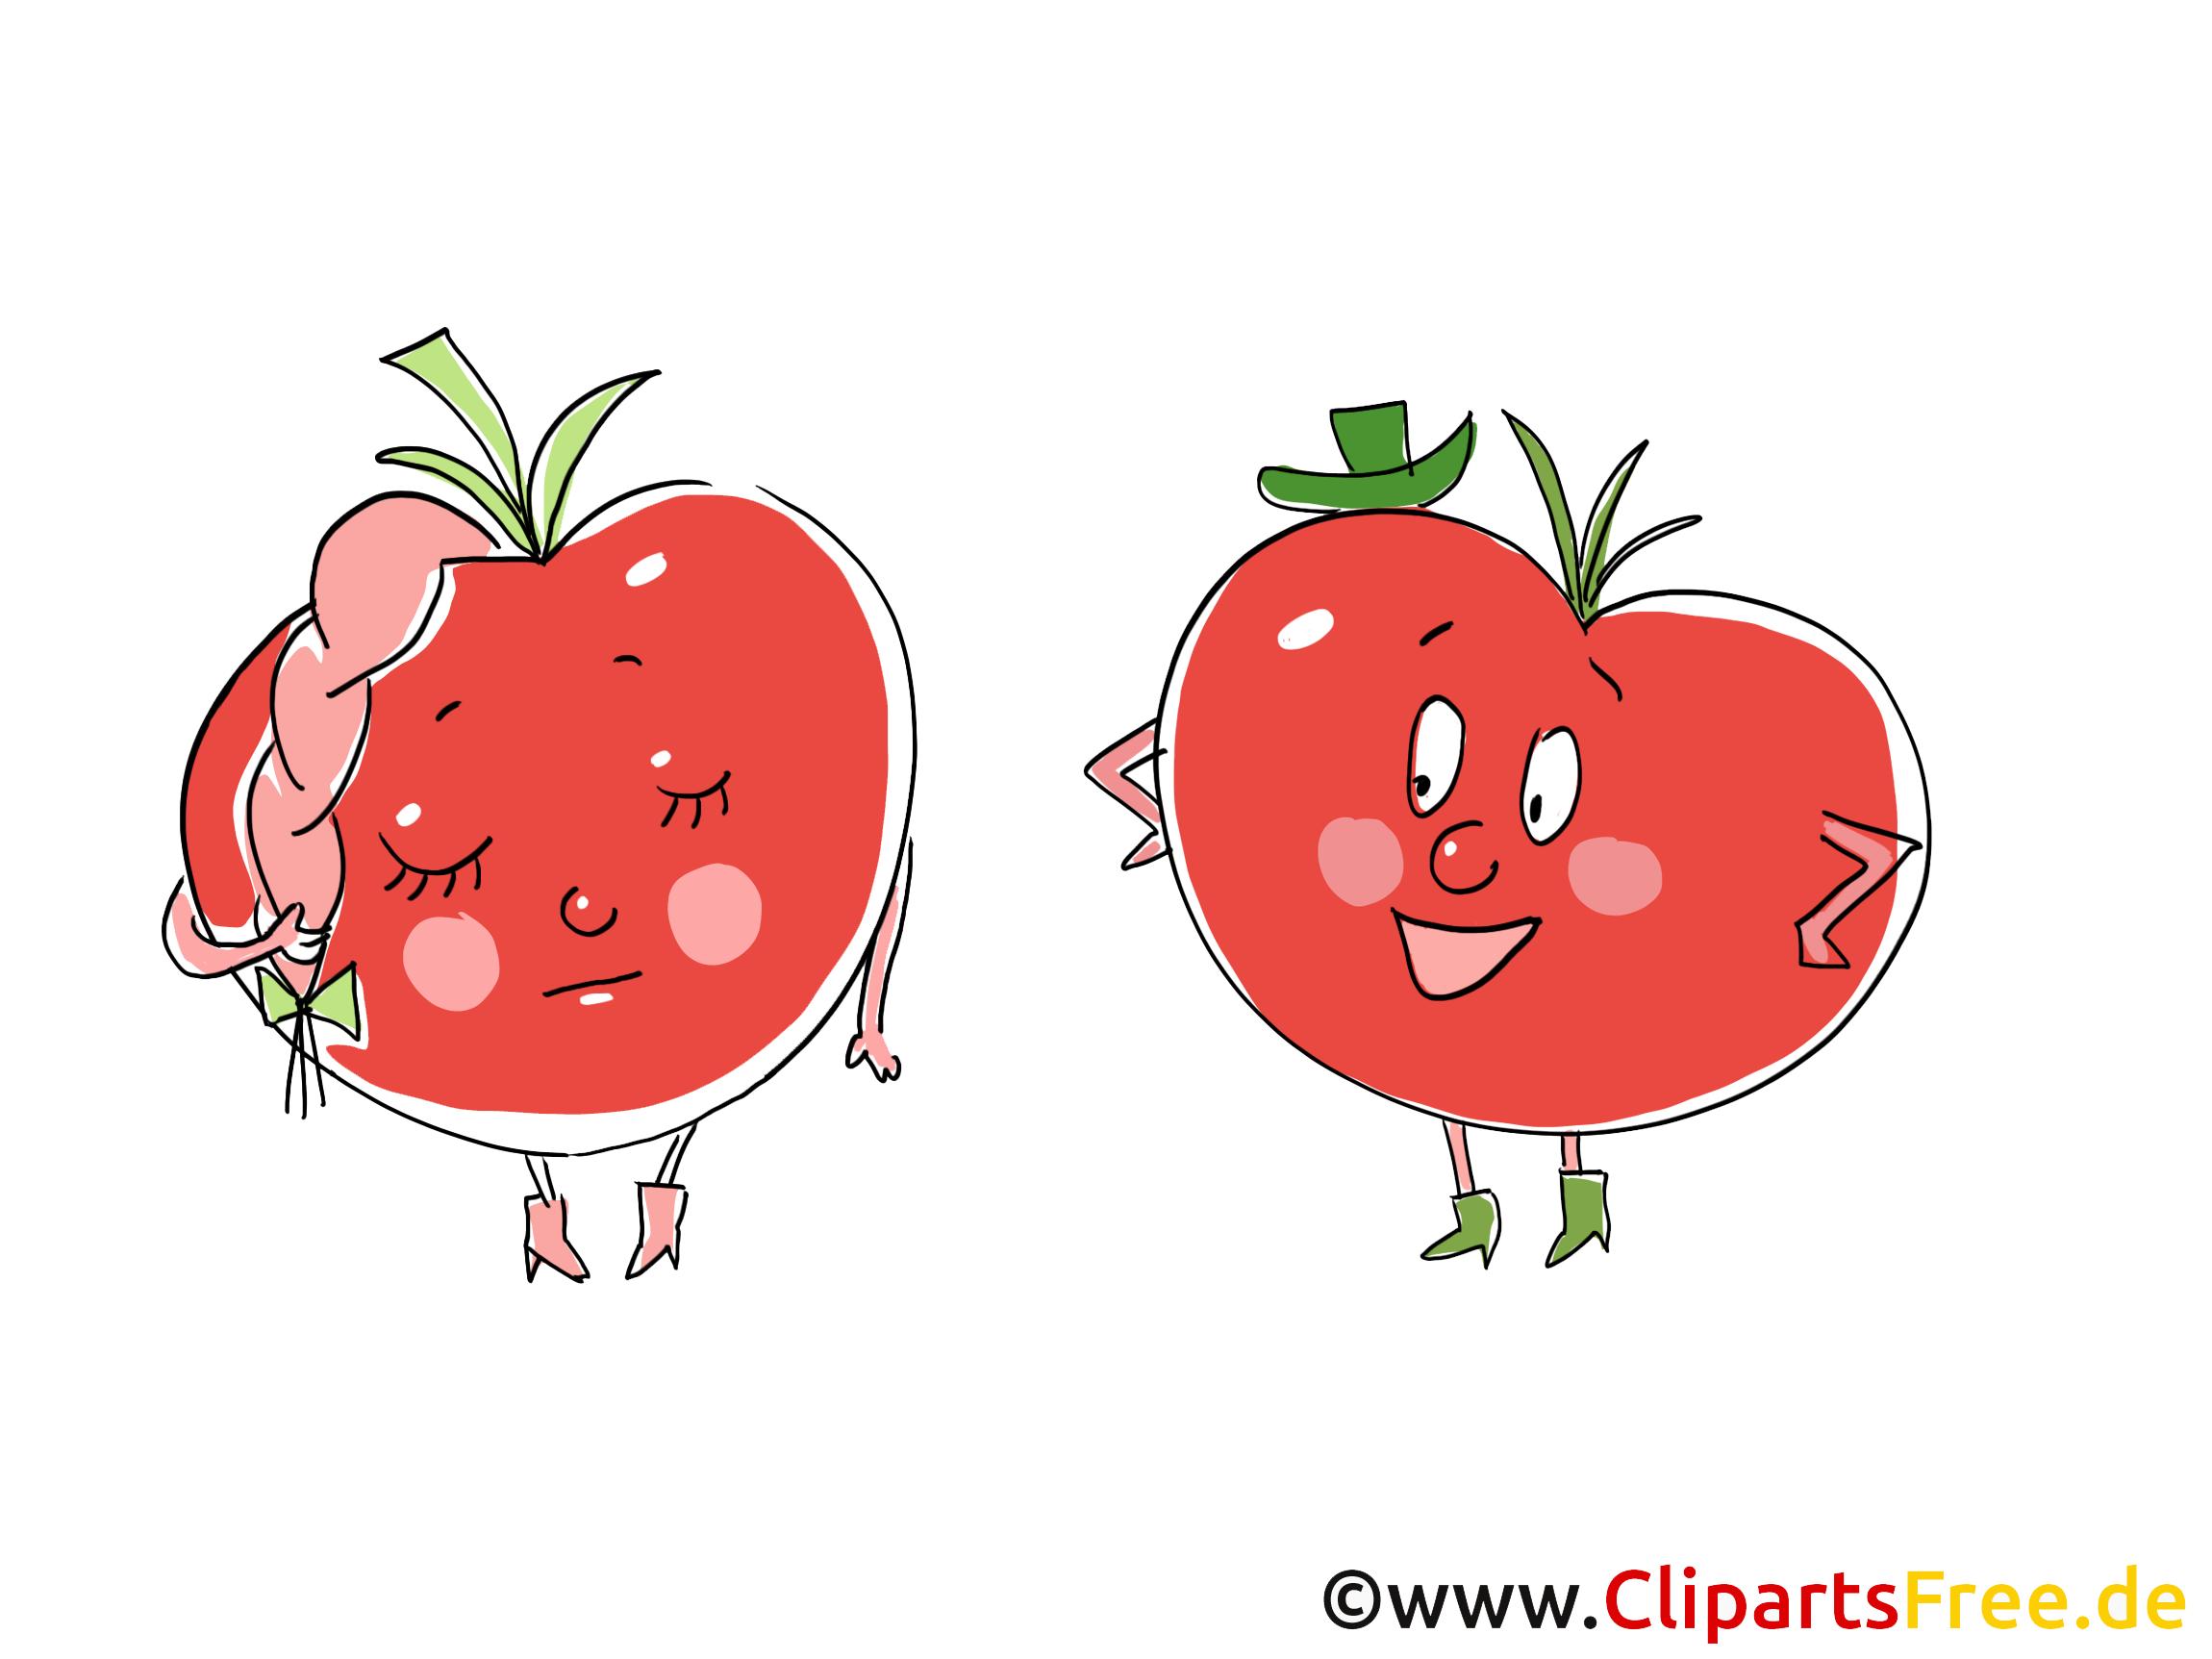 Gemüse cartoon